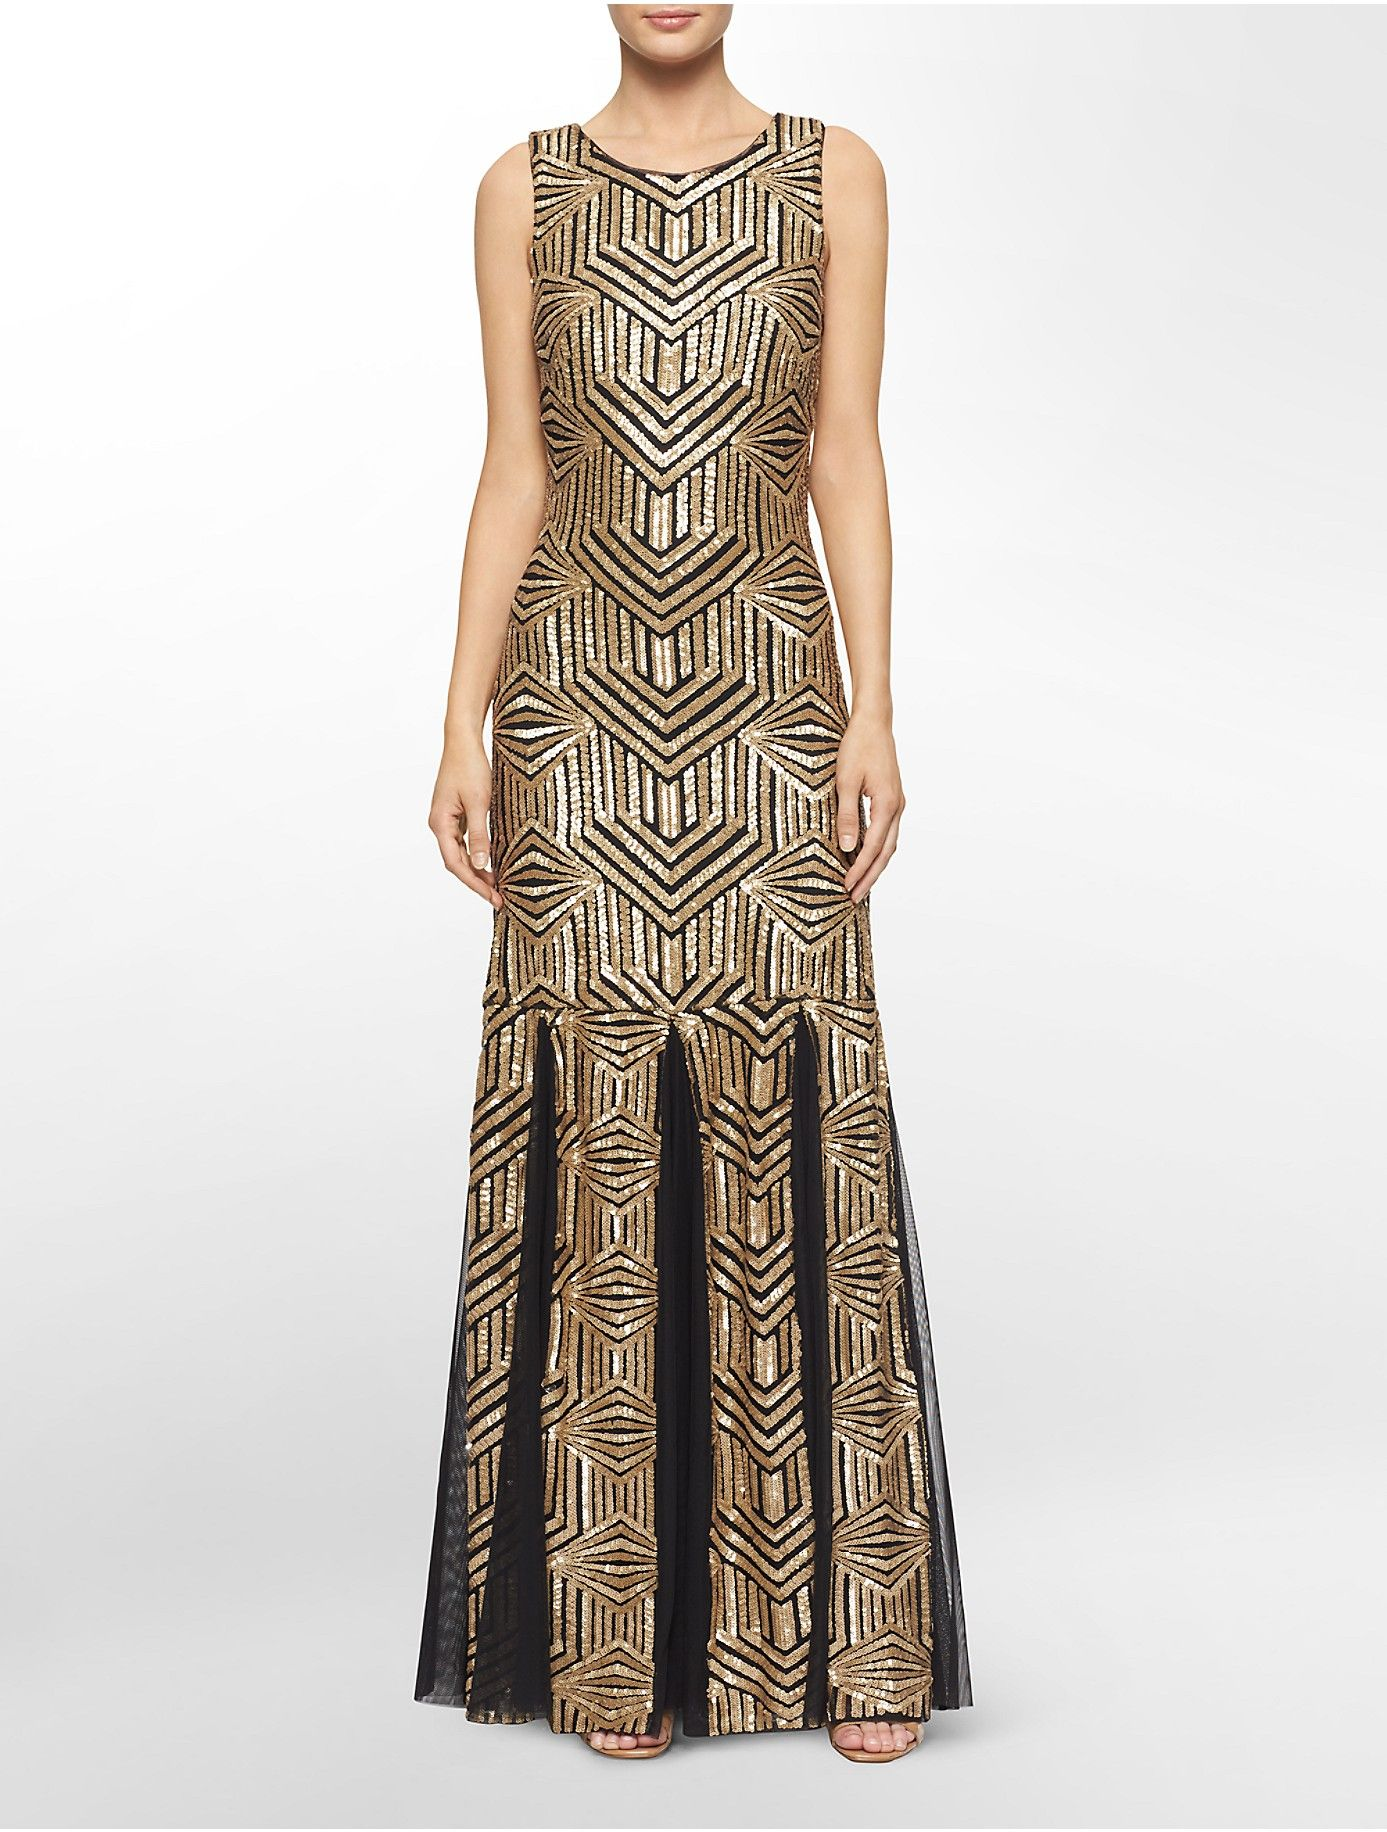 Calvin Klein Art Deco Geometric Gold Black Floor Length Dress With Ets Sequin Gown